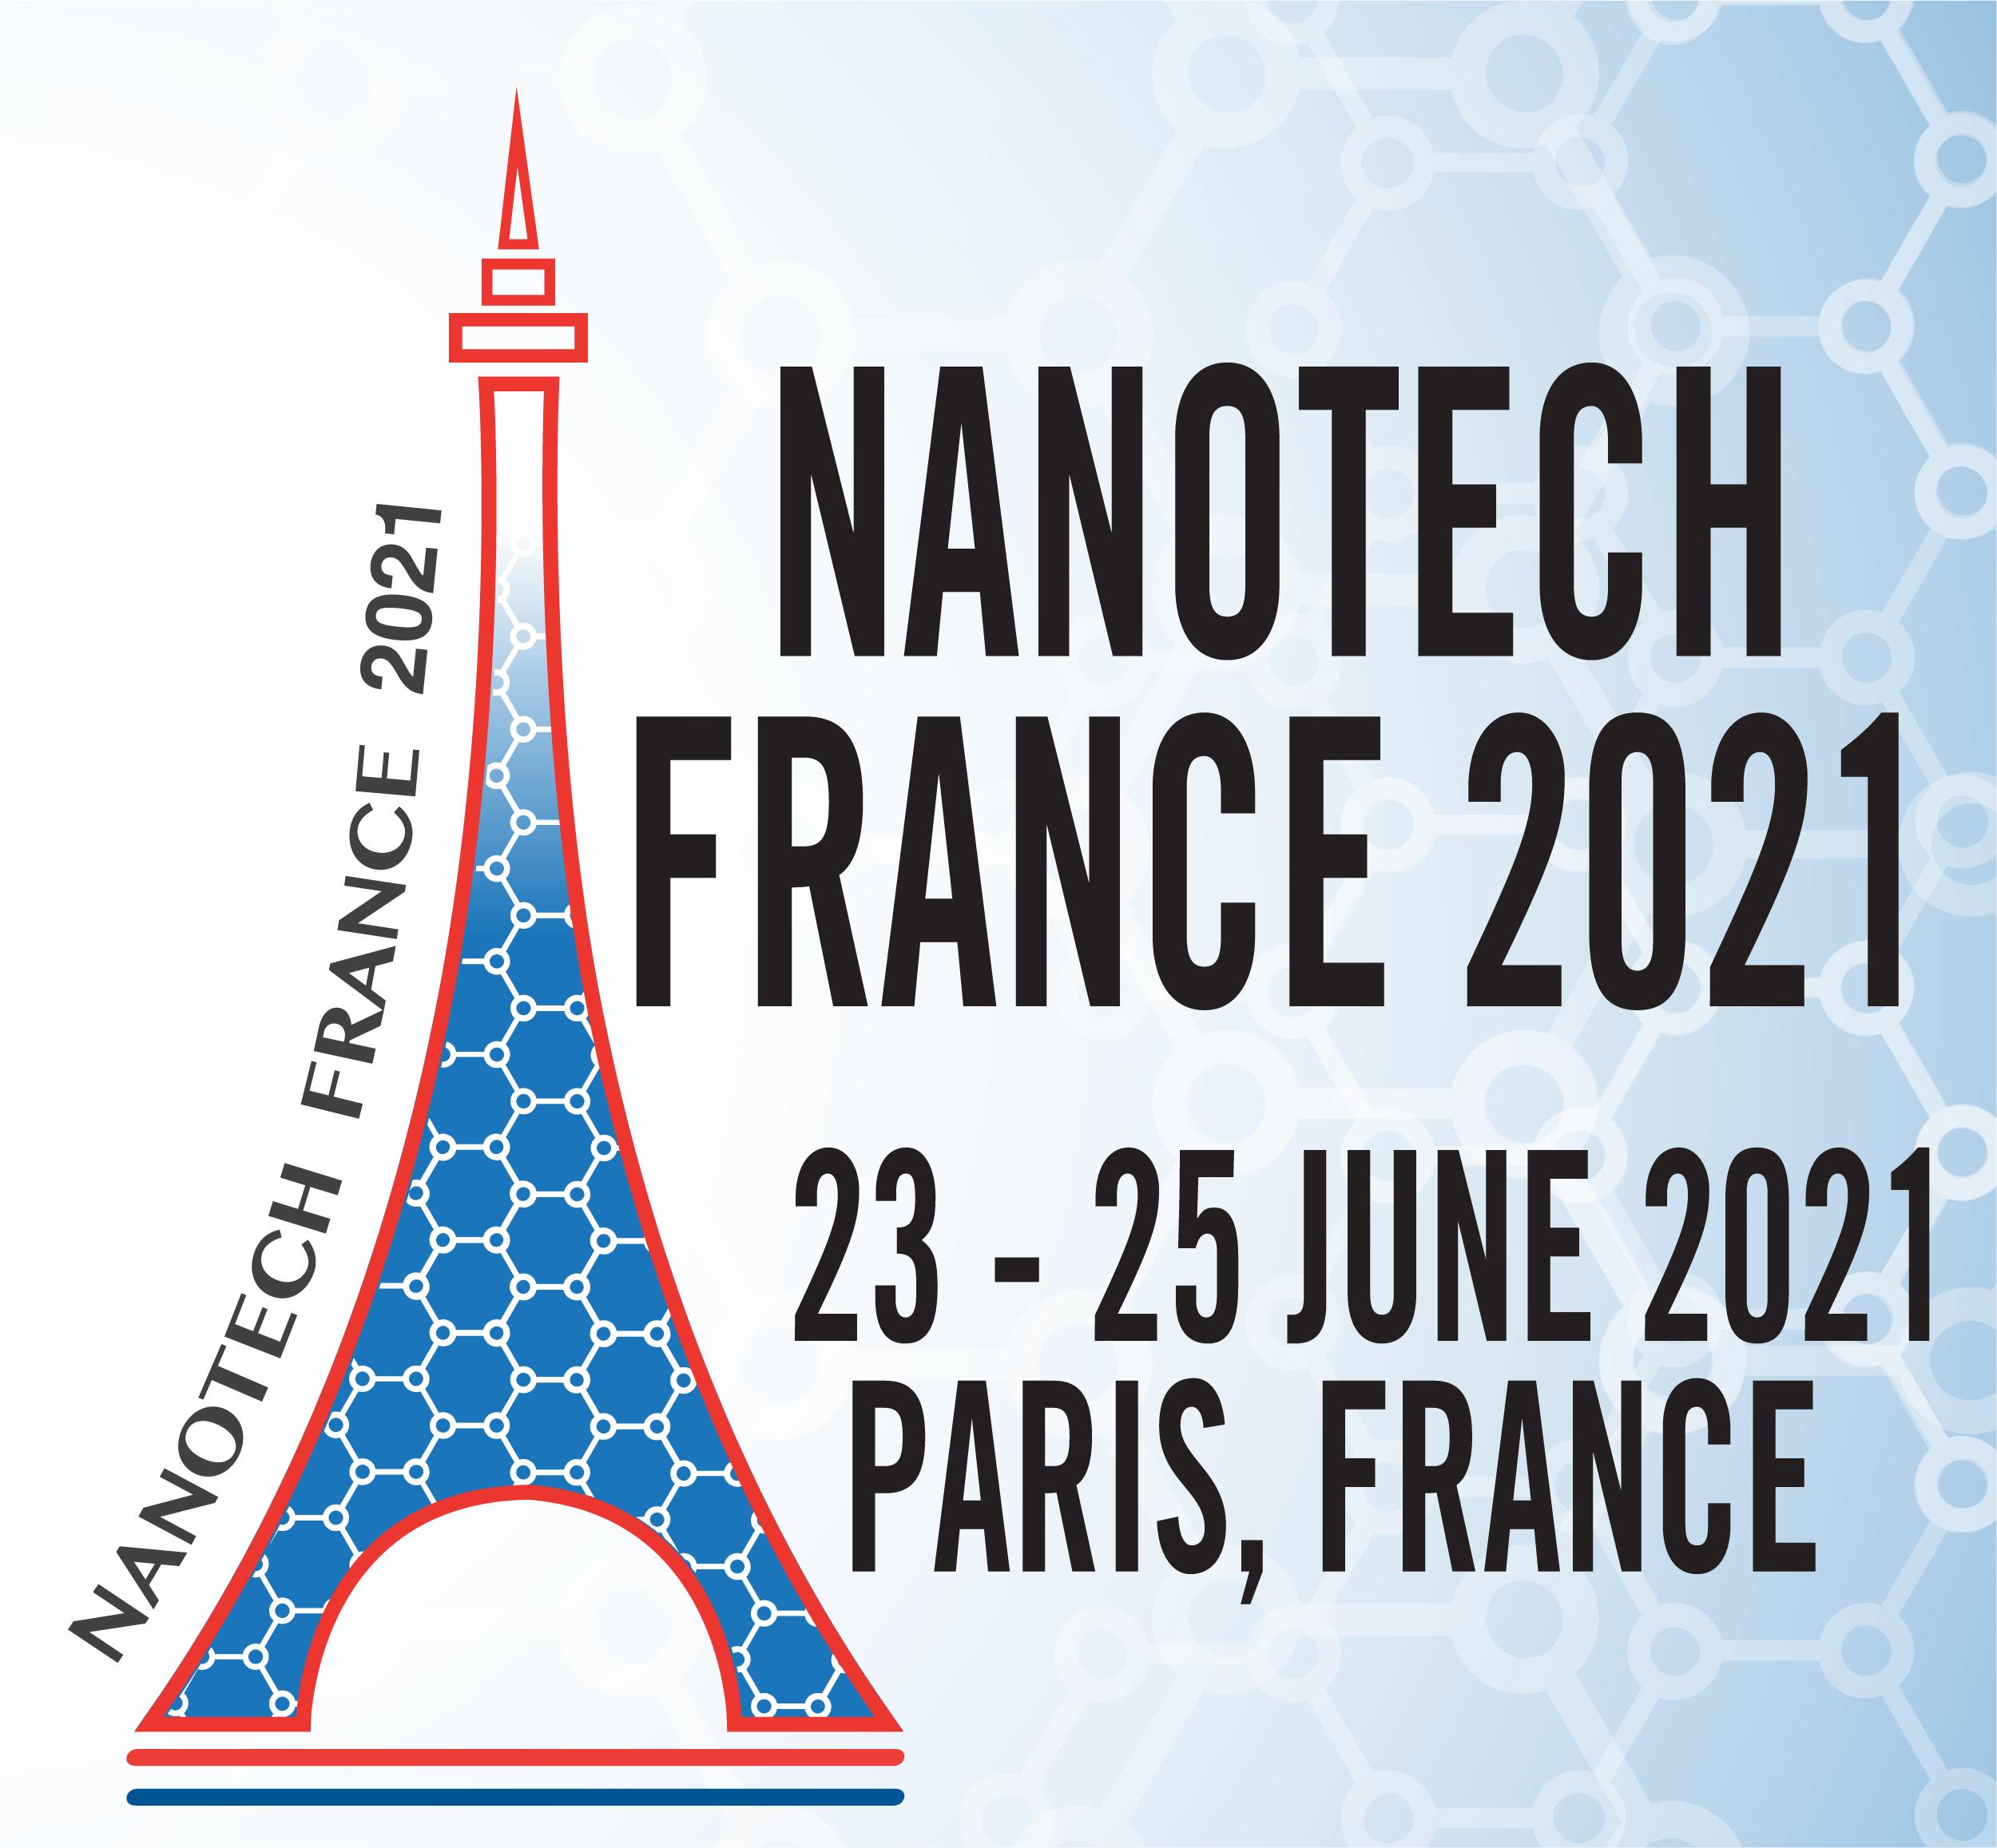 Nanotech France 2020 Conference and Exhibition - Paris, France, 23 - 25 June, 2021